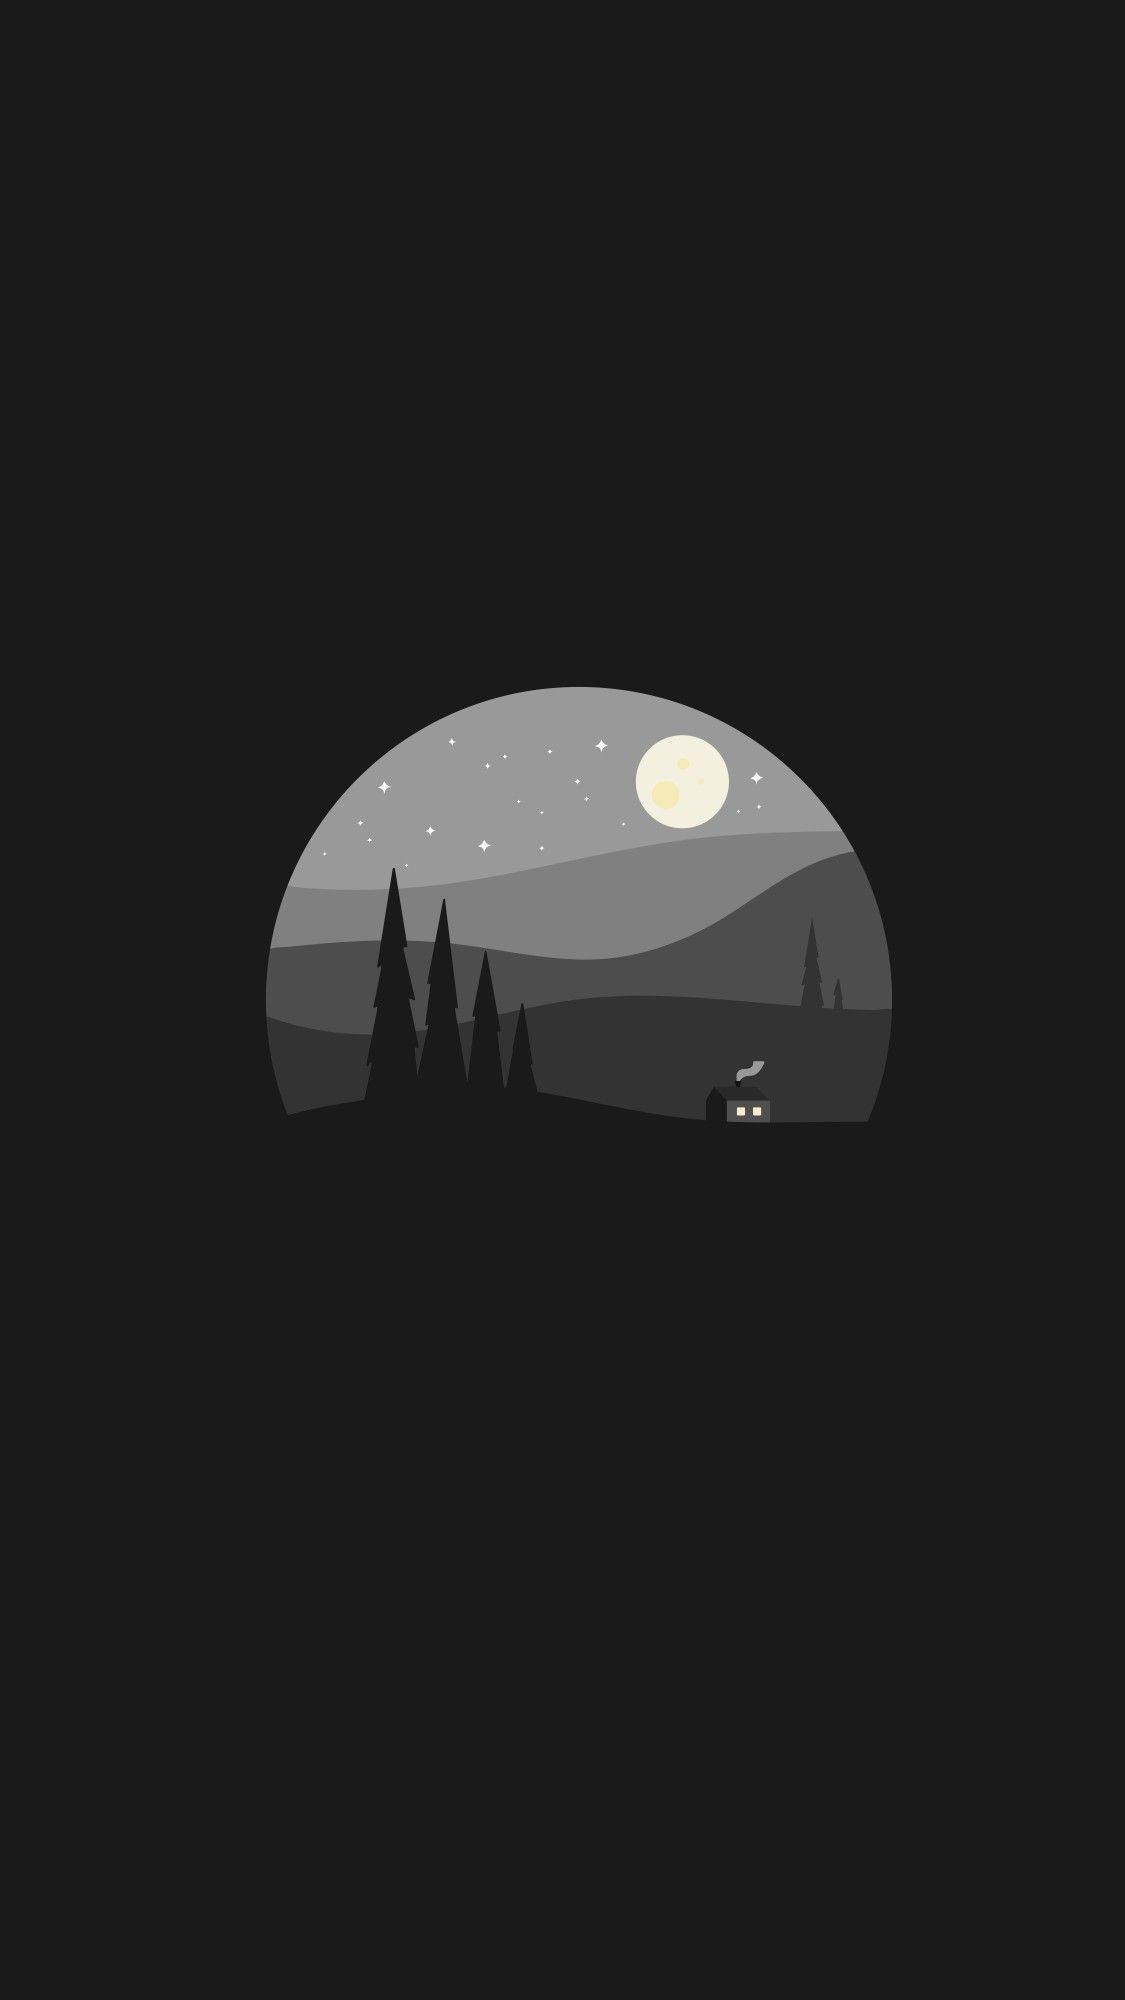 Dark Wallpaper Full Hd For Android